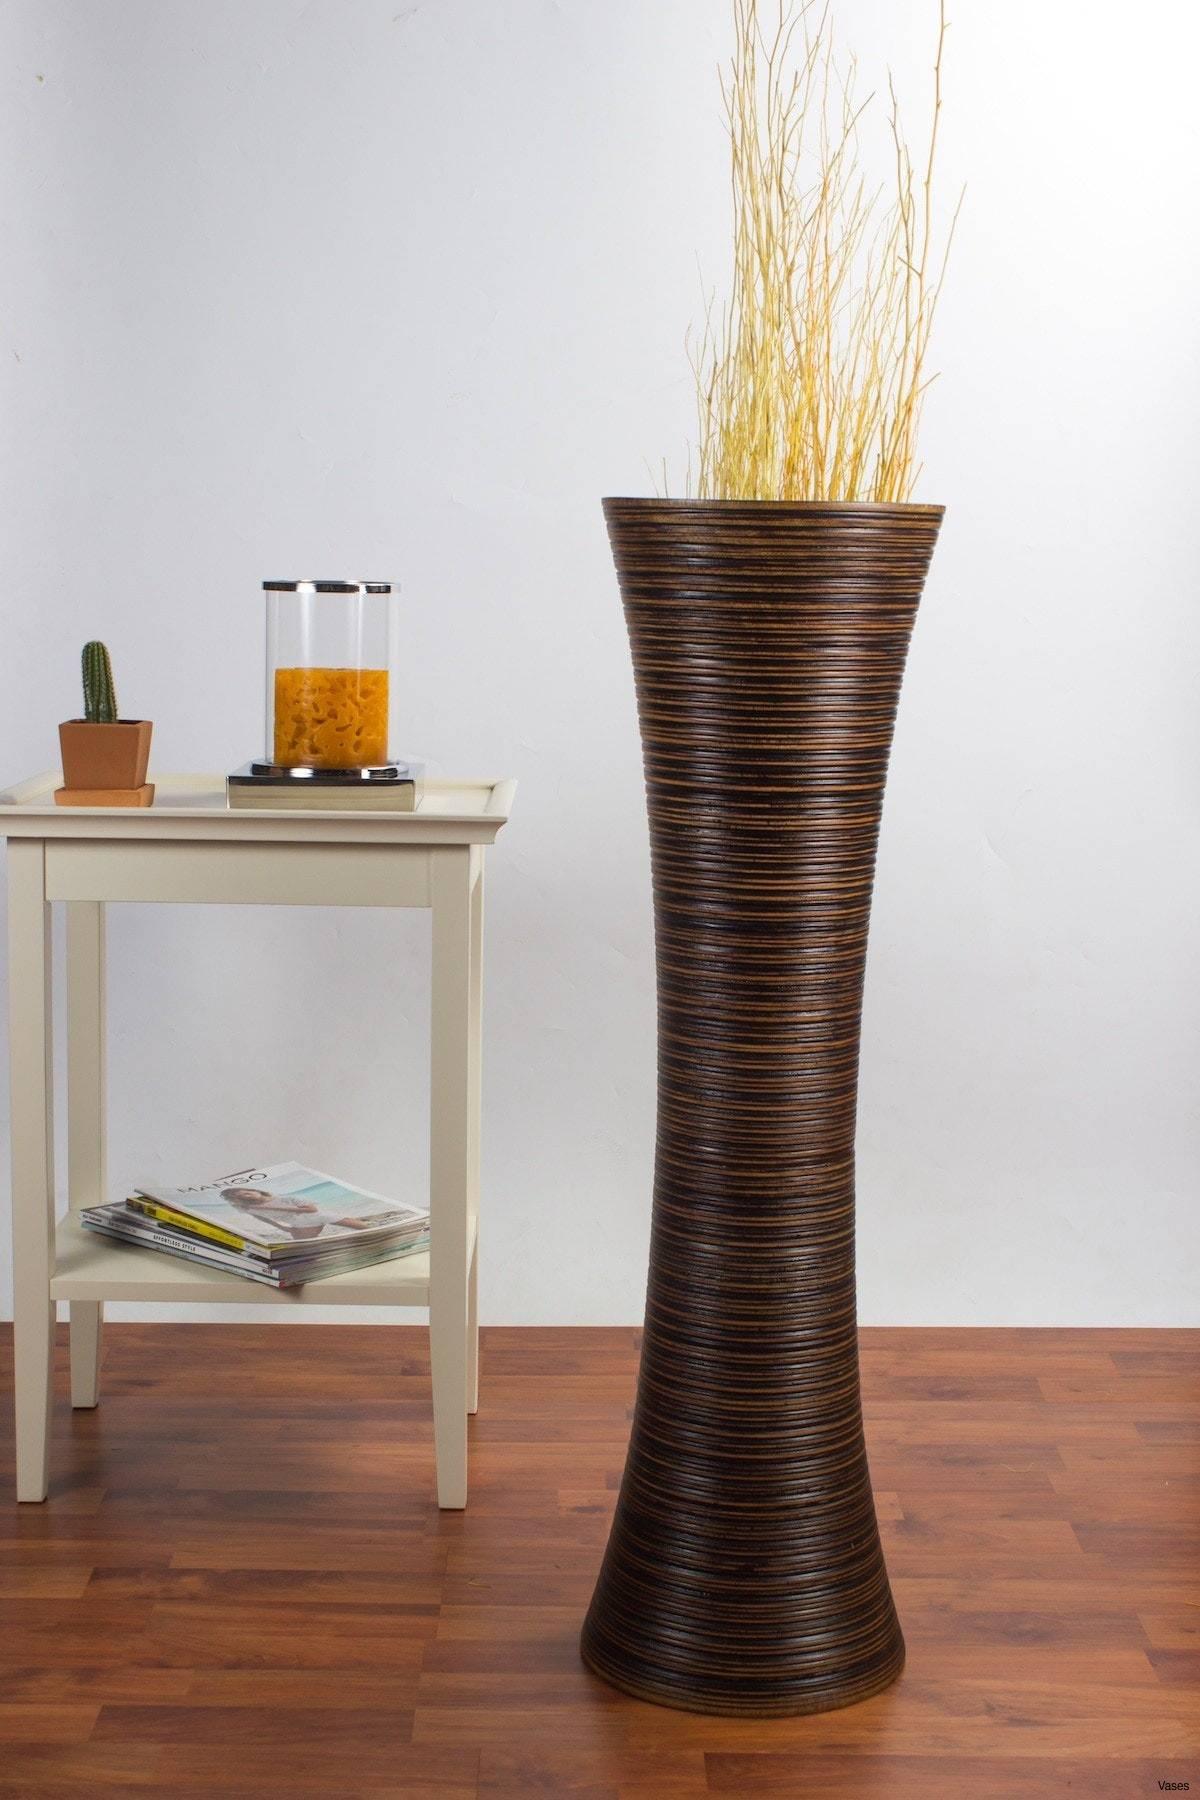 12 inch vase of floor vase inspirational decorative floor vases fresh d dkbrw 5749 for floor vase inspirational decorative floor vases fresh d dkbrw 5749 1h vases tall brown i 0d